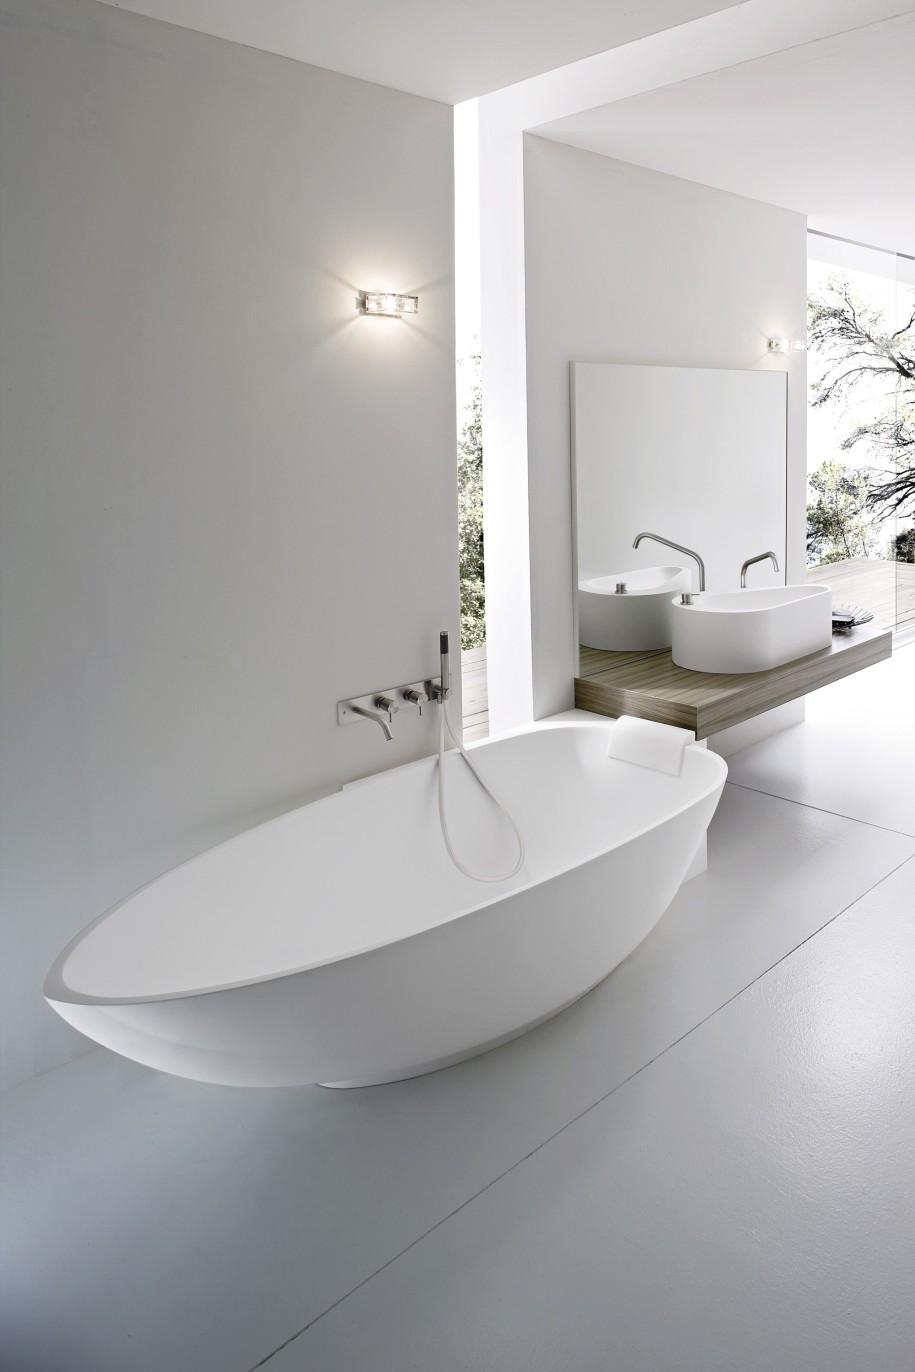 30 Bathtubs Designs Ideas To Make Your Bathroom Luxurious